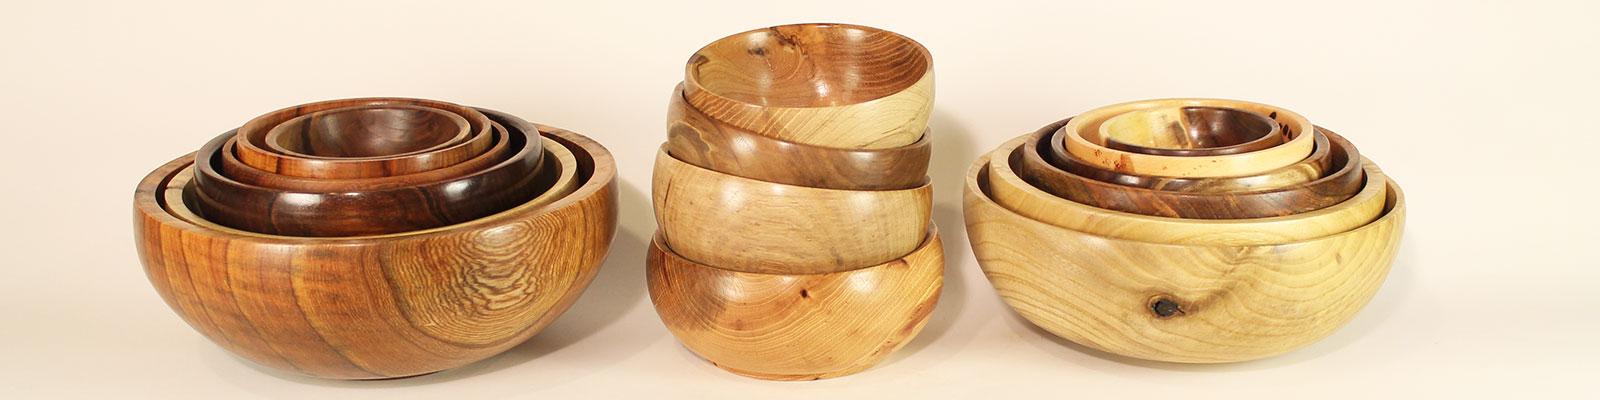 PDF DIY Woodturning Download woodwork designs in chennai ...